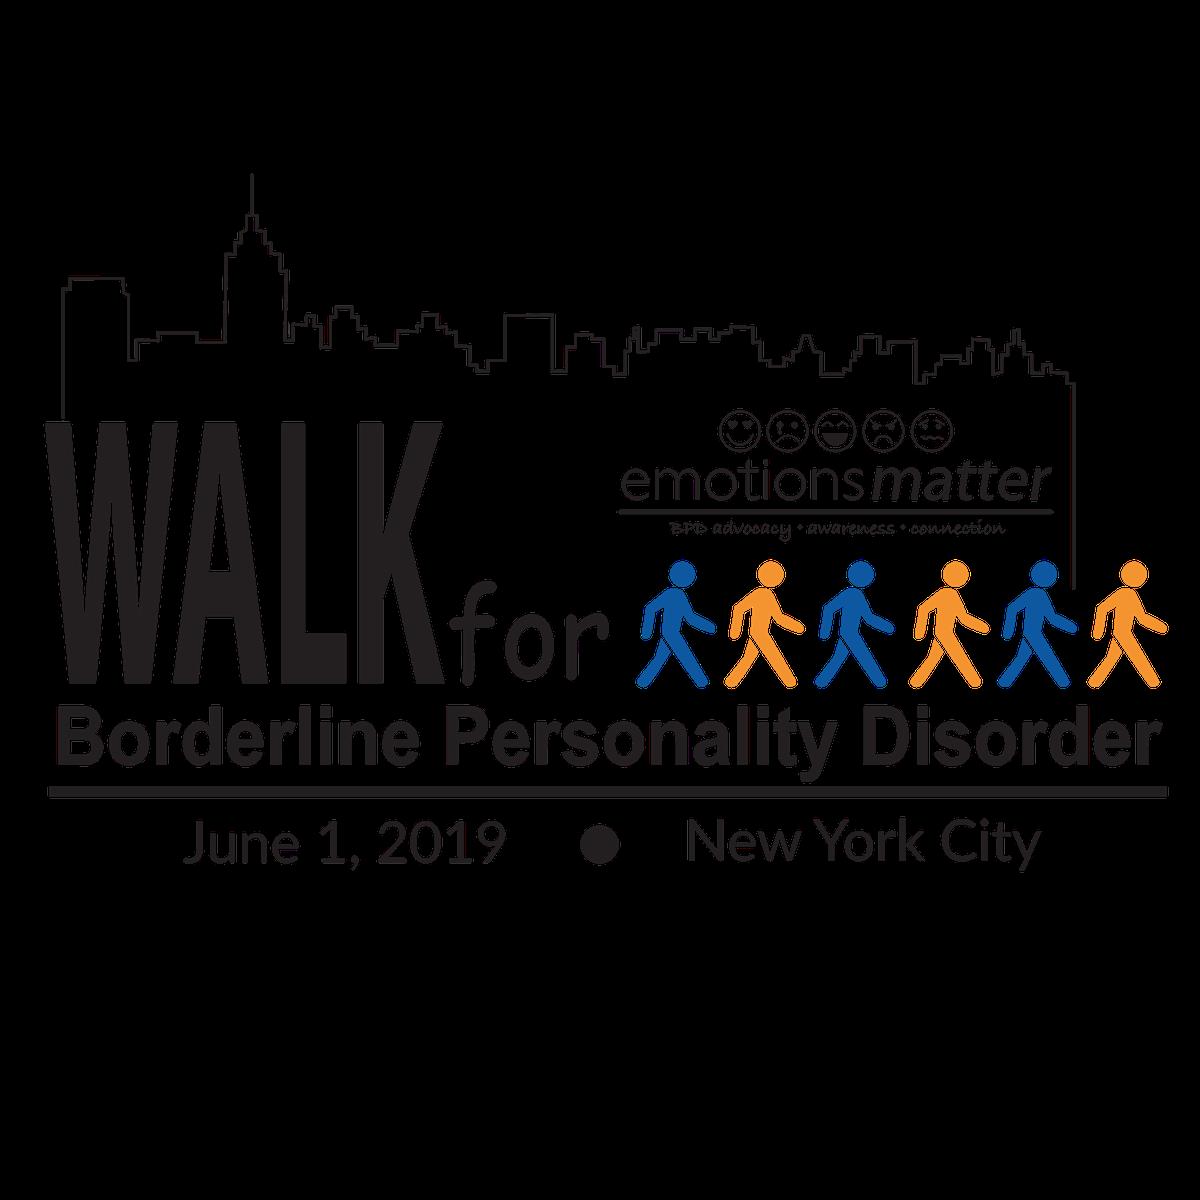 Walk for Borderline Personality Disorder 2019